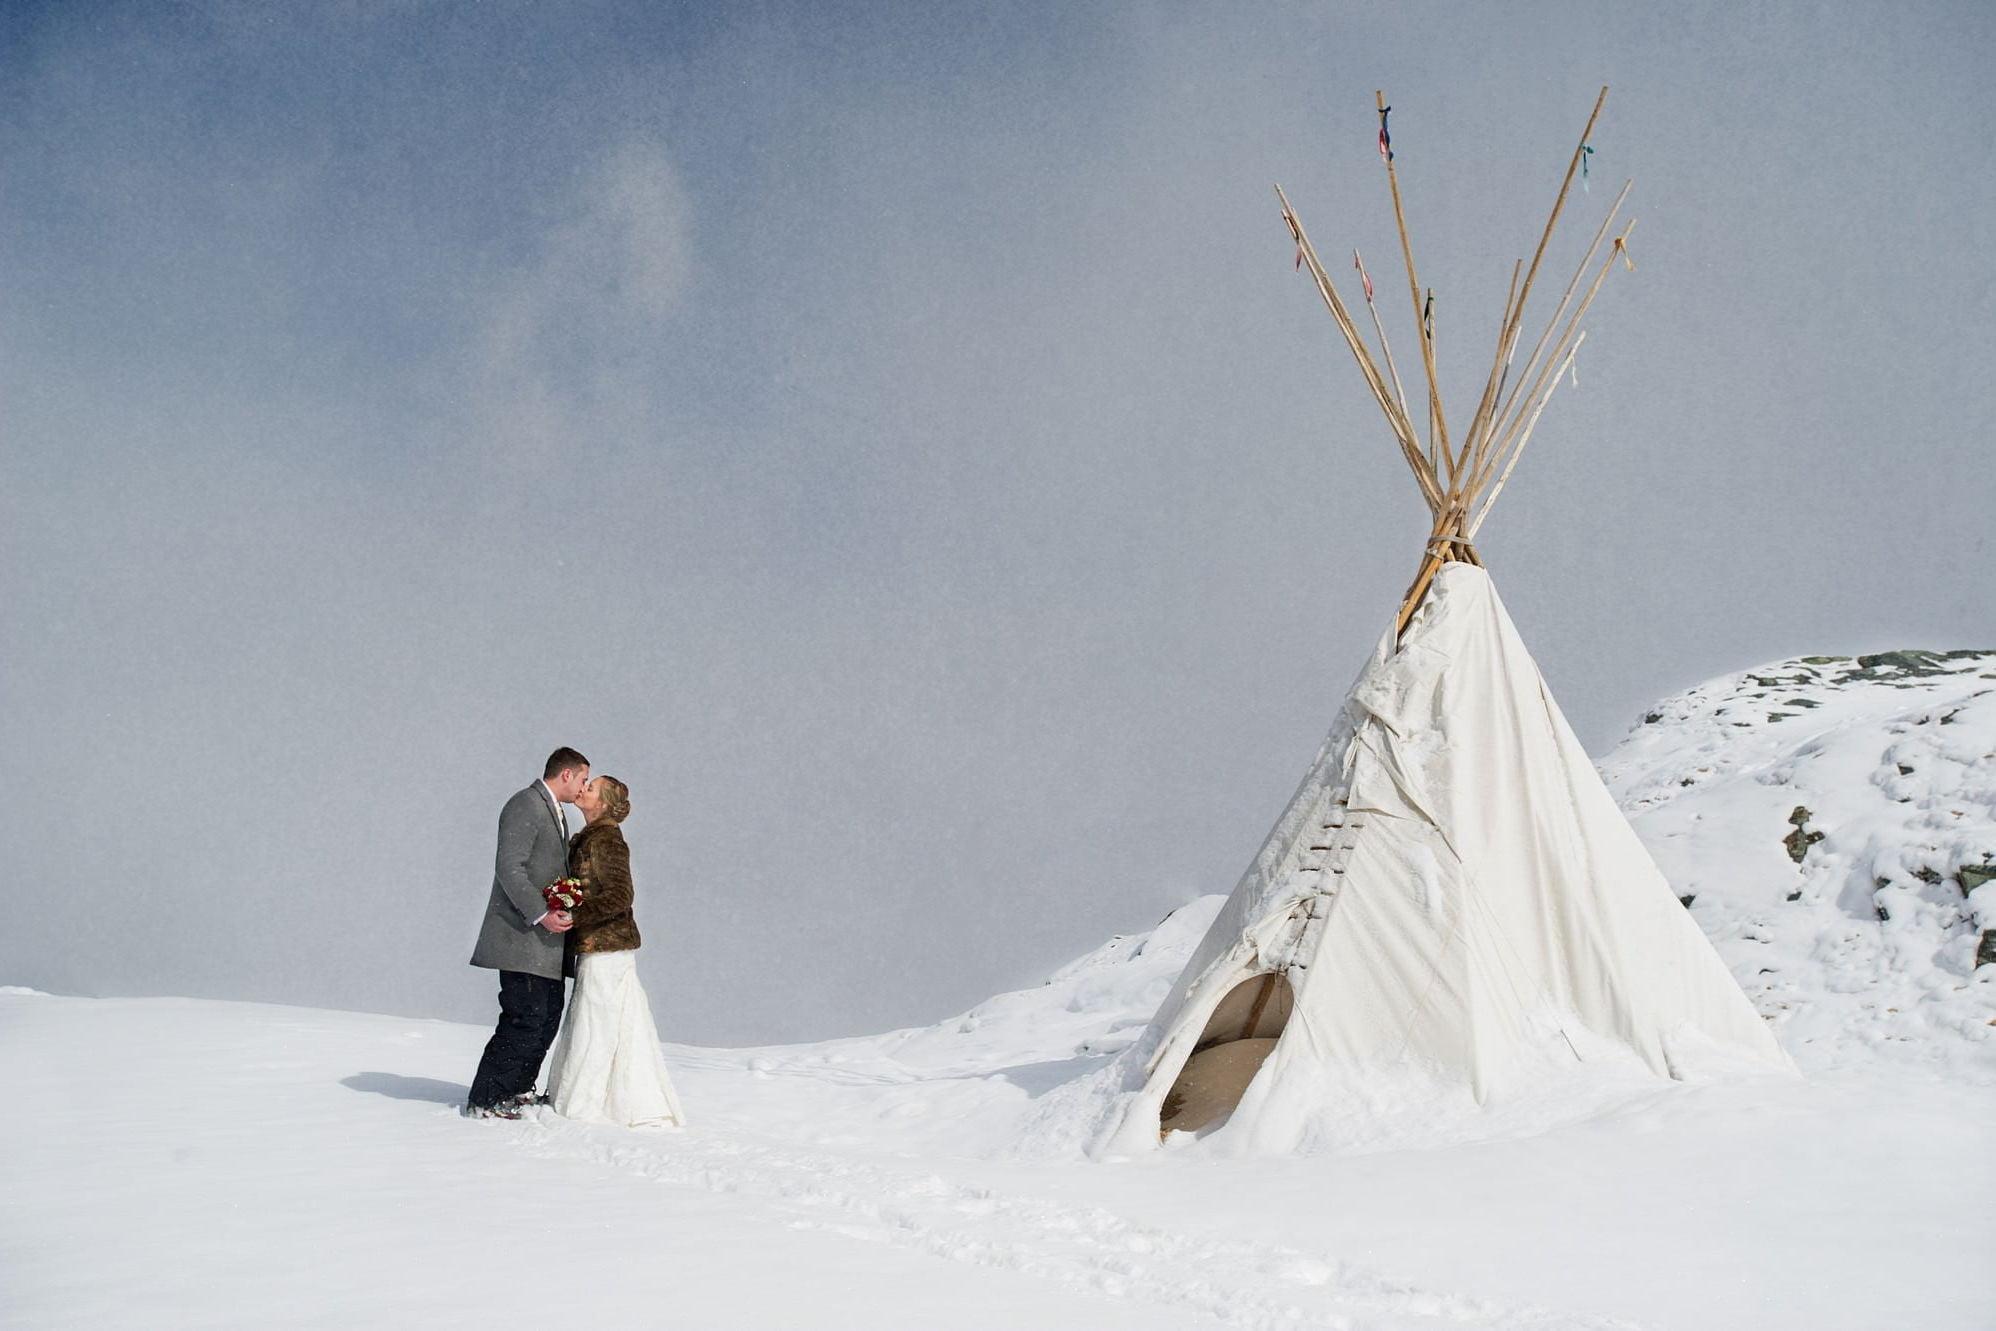 Zermatt wedding photographer